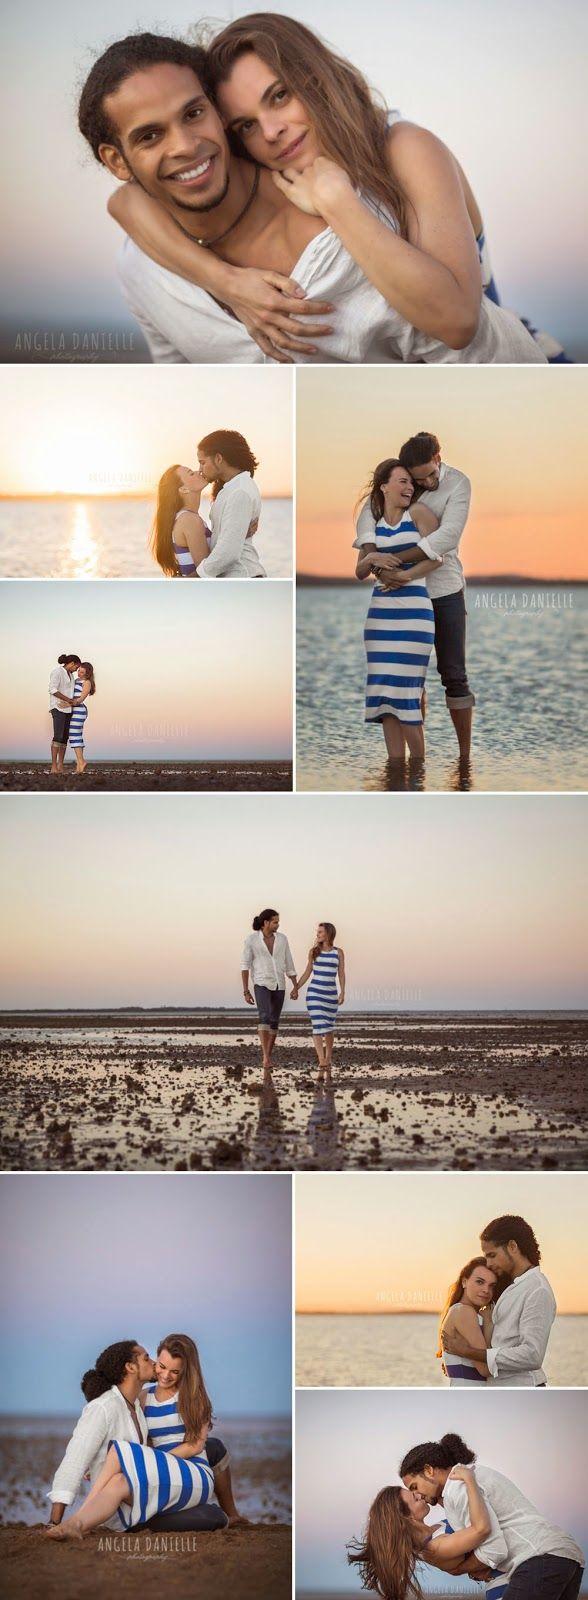 www.angeladanielle.com.au Brisbane based photographer.  Gorgeous couples session.